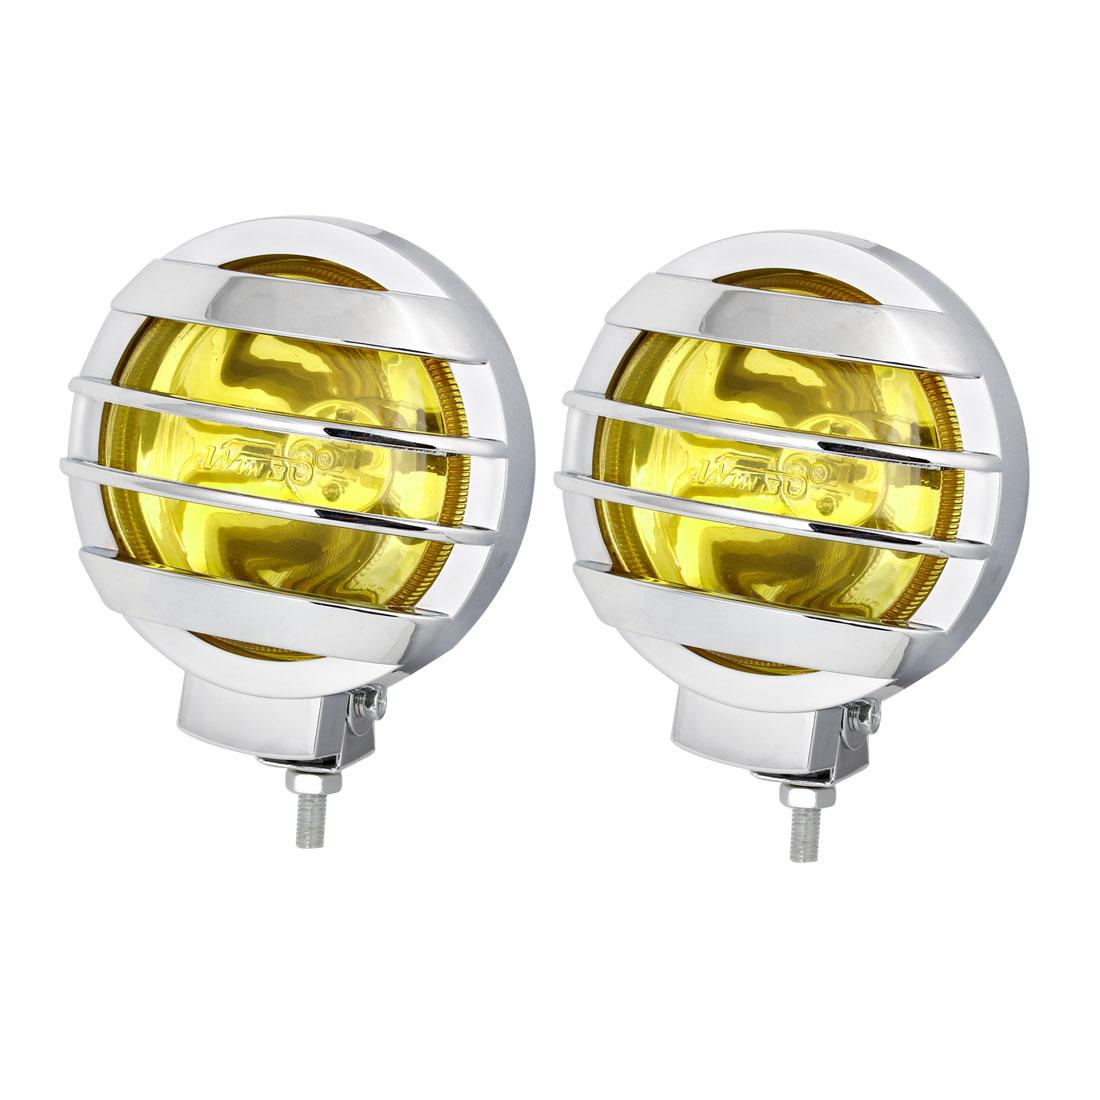 Unique Bargains Car Auto 12V 55-85W H3 Socket Amber Lamp Foglights Driving Light 12V 2 Pcs